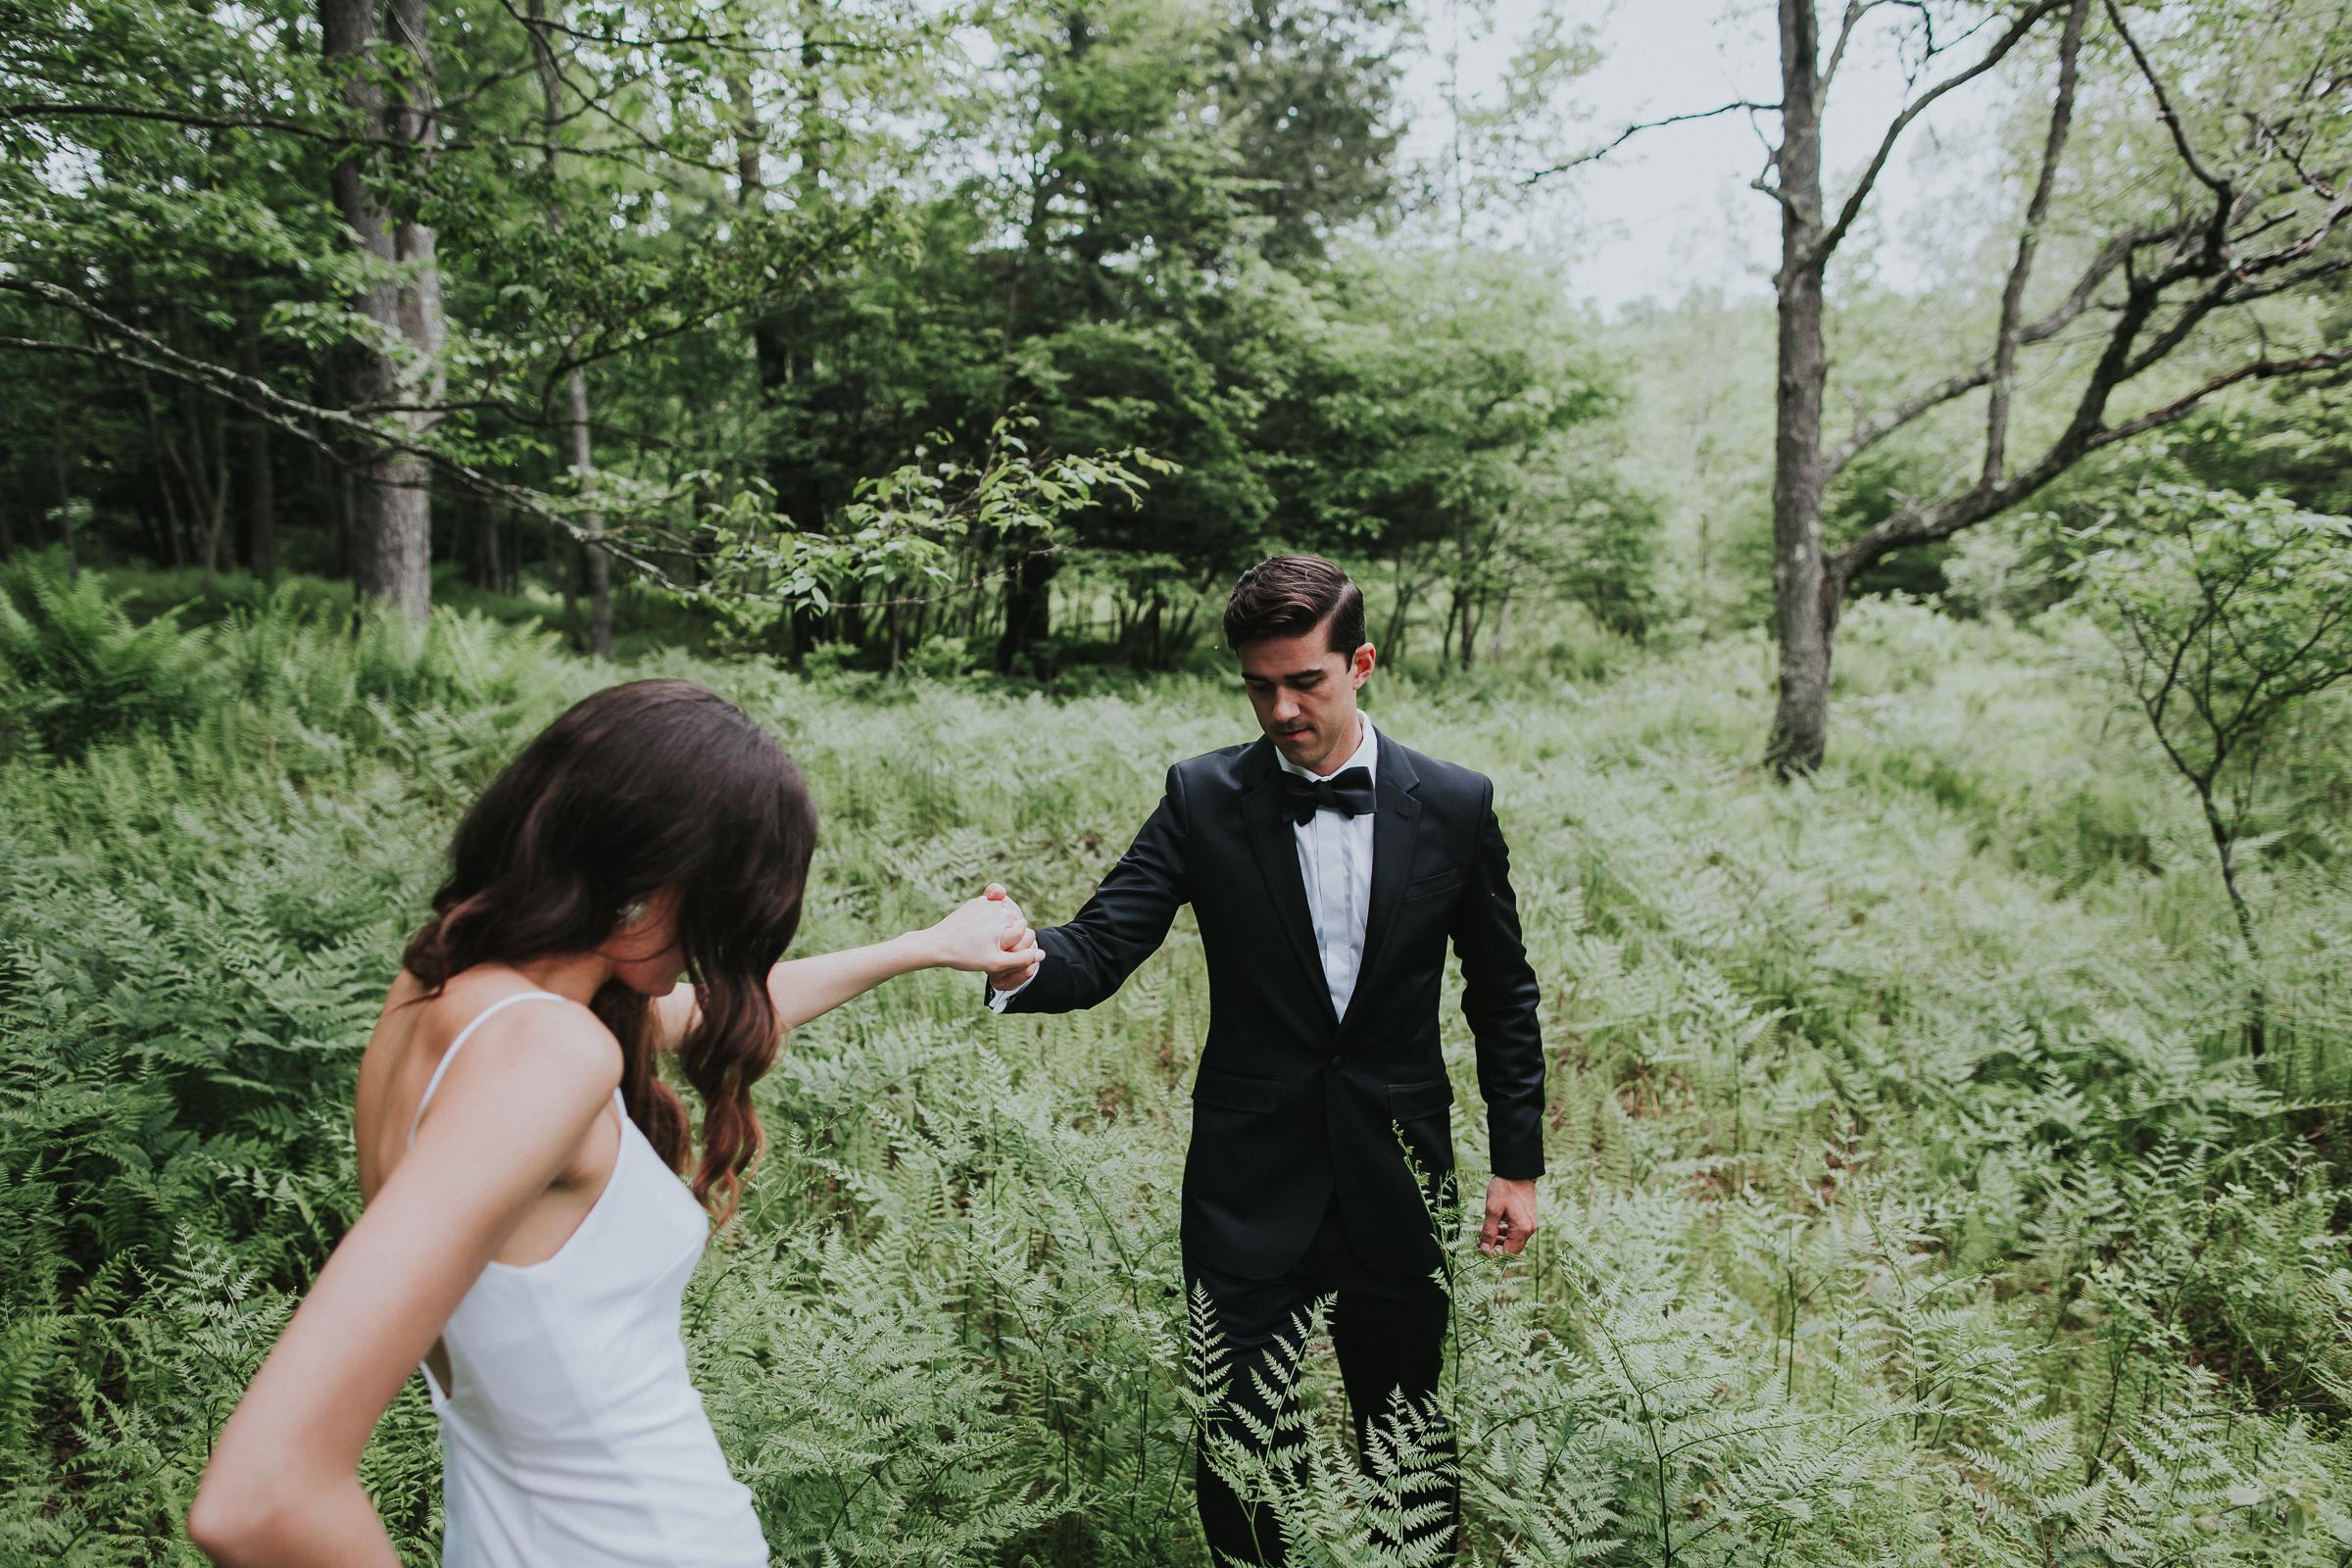 Handsome-Hollow-Long-Eddy-Catskills-New-York-Fine-Art-Documentary-Wedding-Photographer-90.jpg